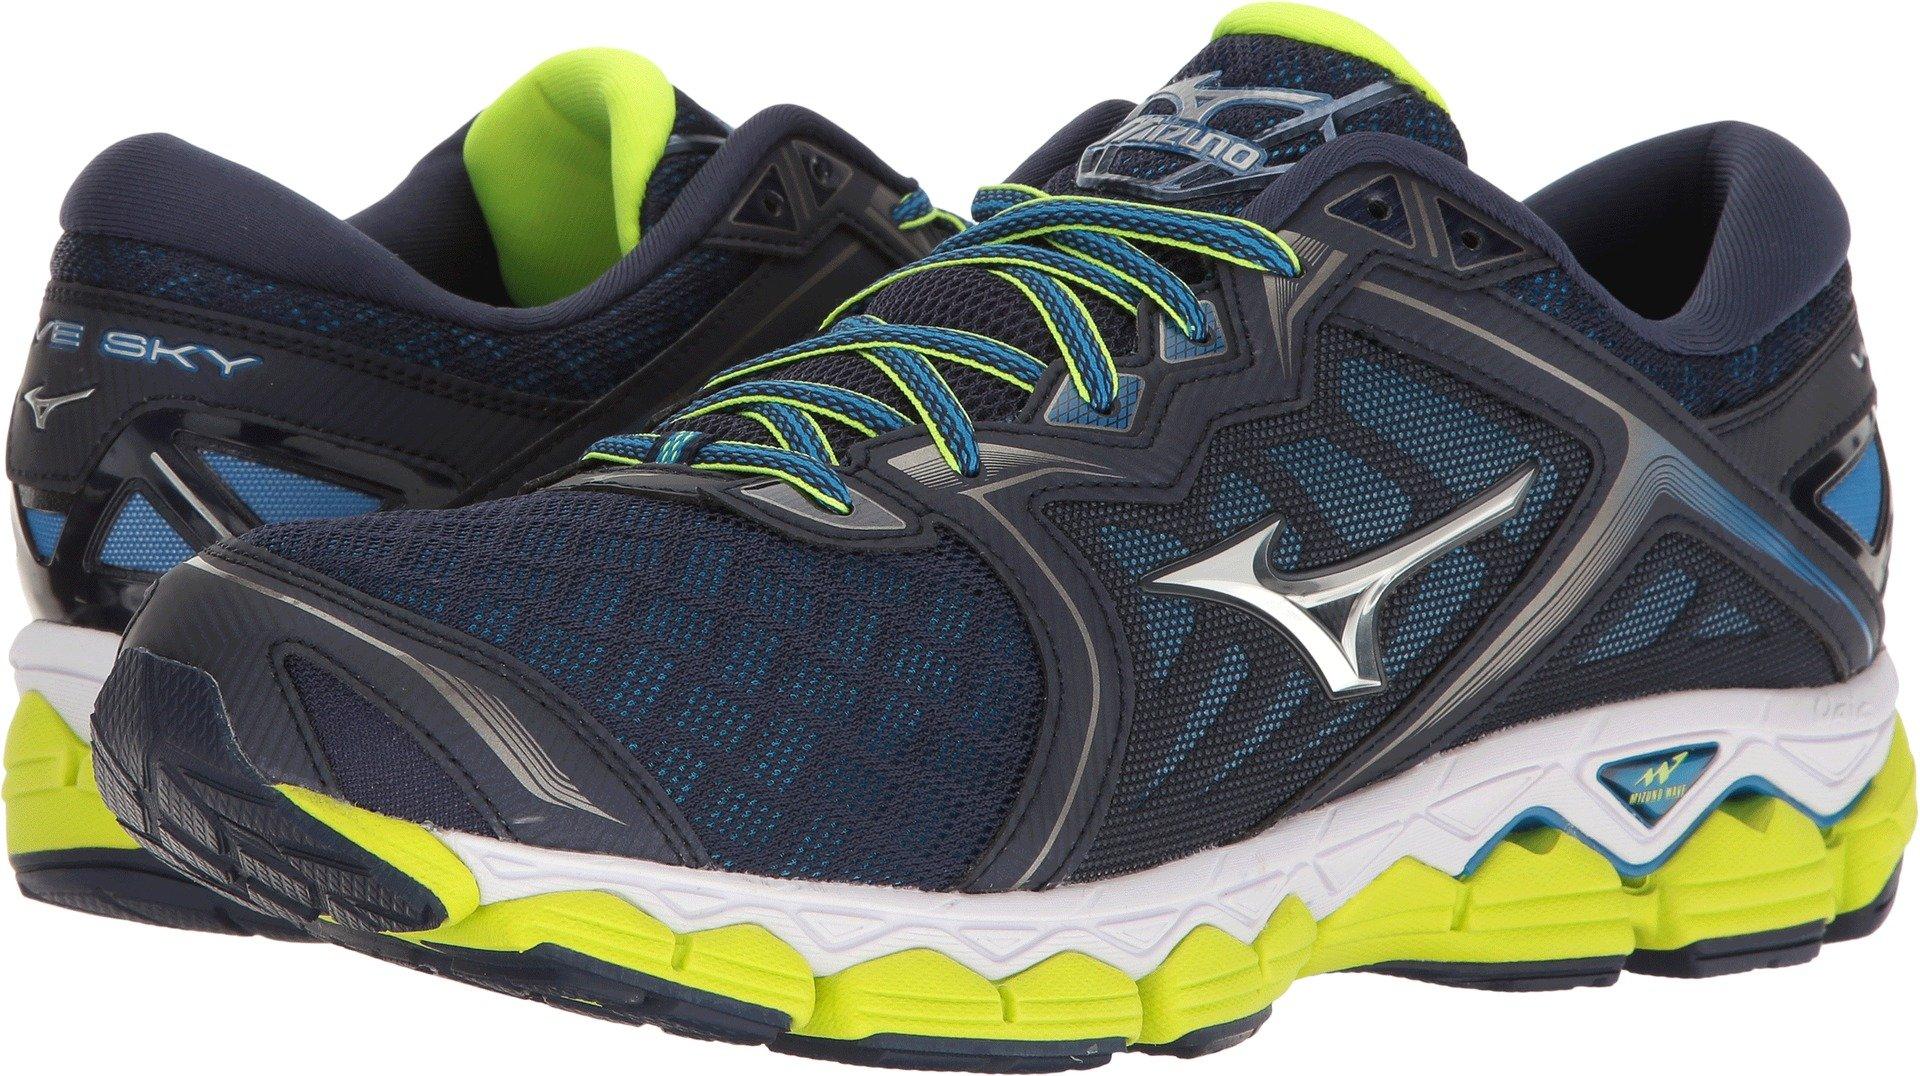 Mizuno Men's Wave Sky Running Shoe, Peacoat/Silver/Safety Yellow, 10.5 D US